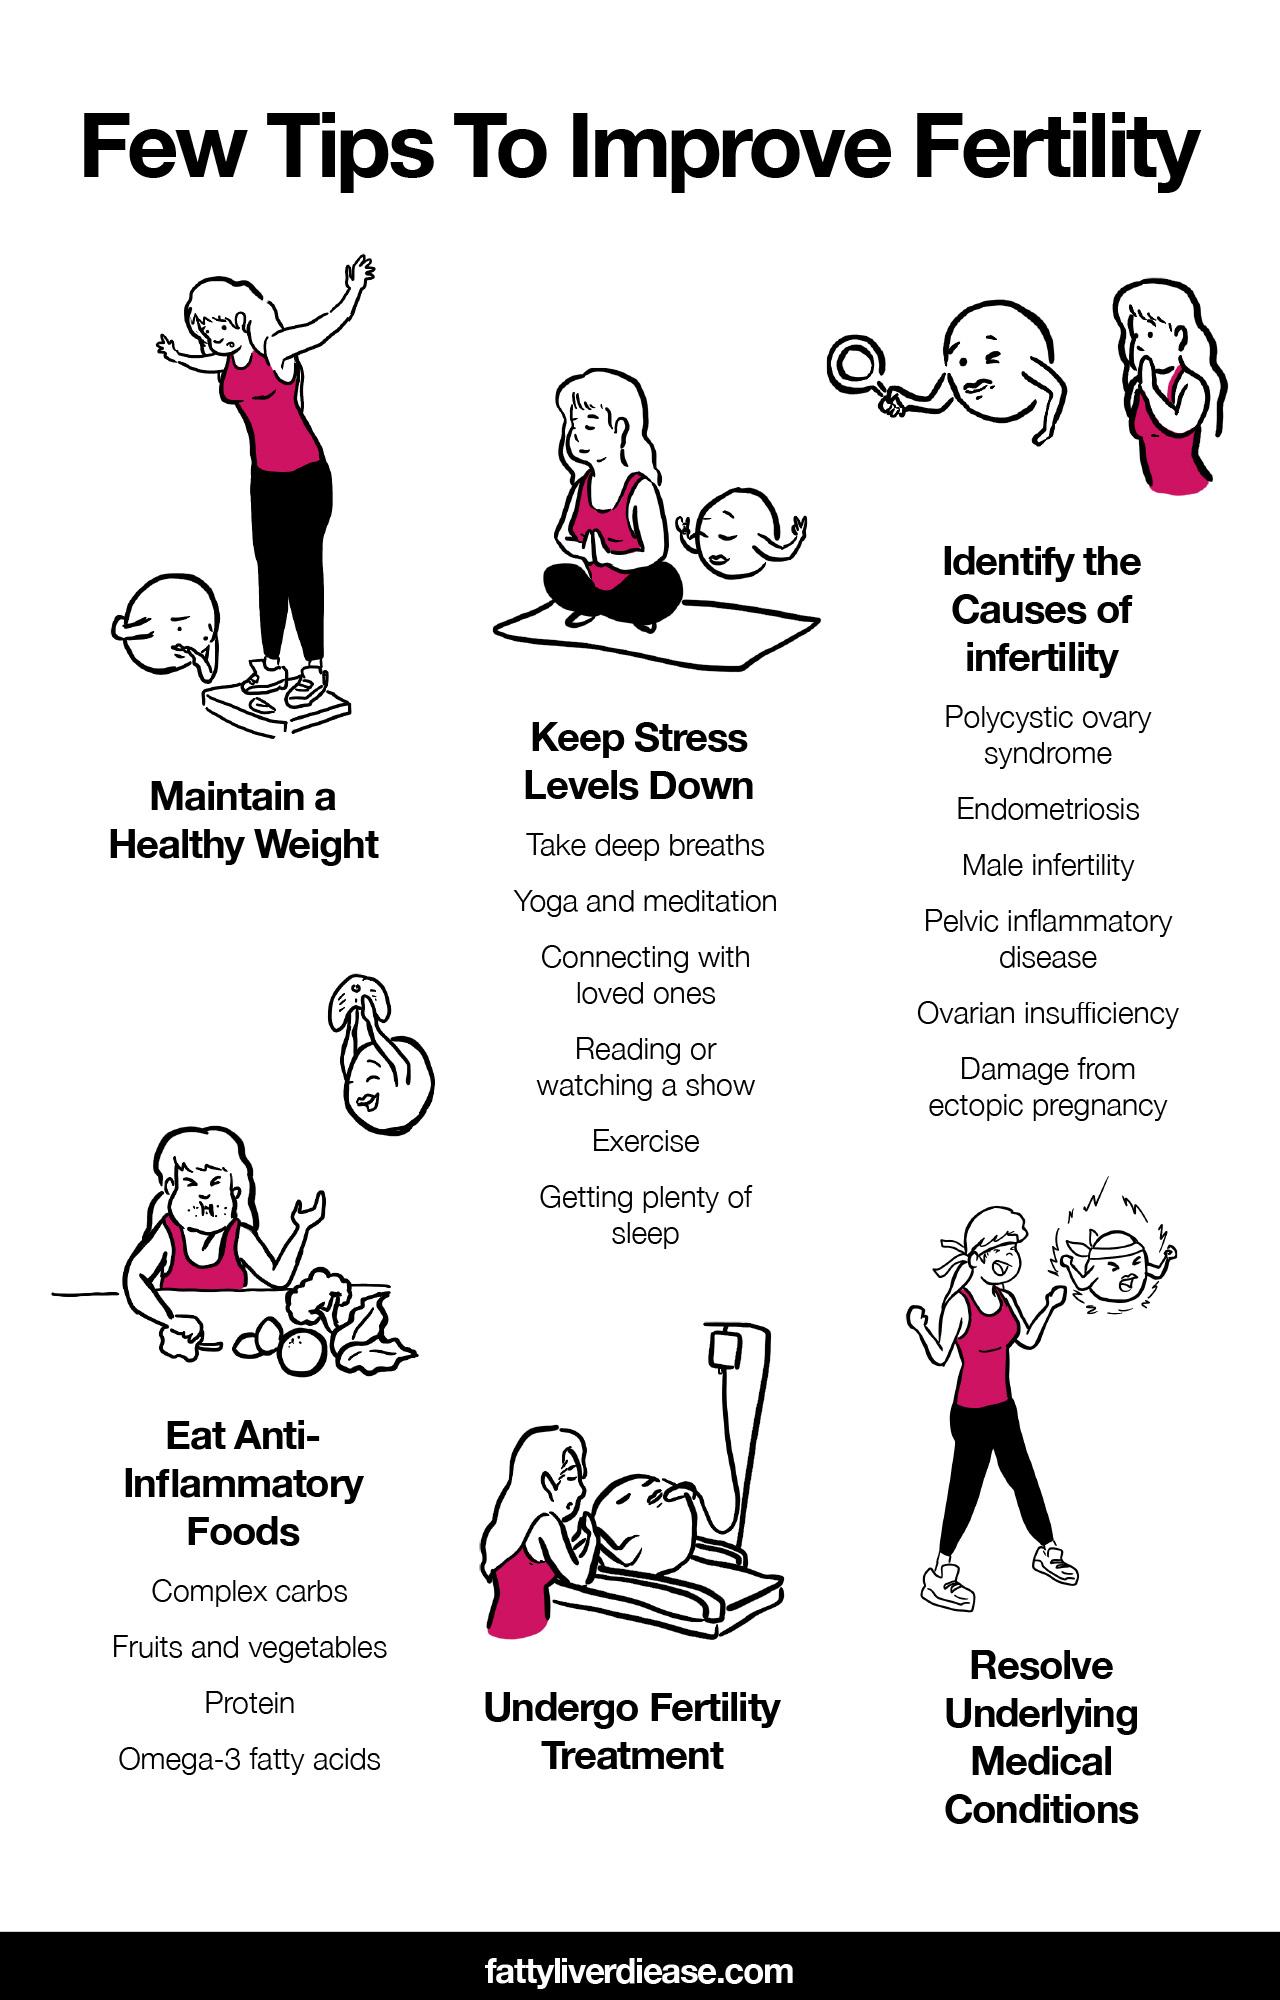 Few Tips To Improve Fertility